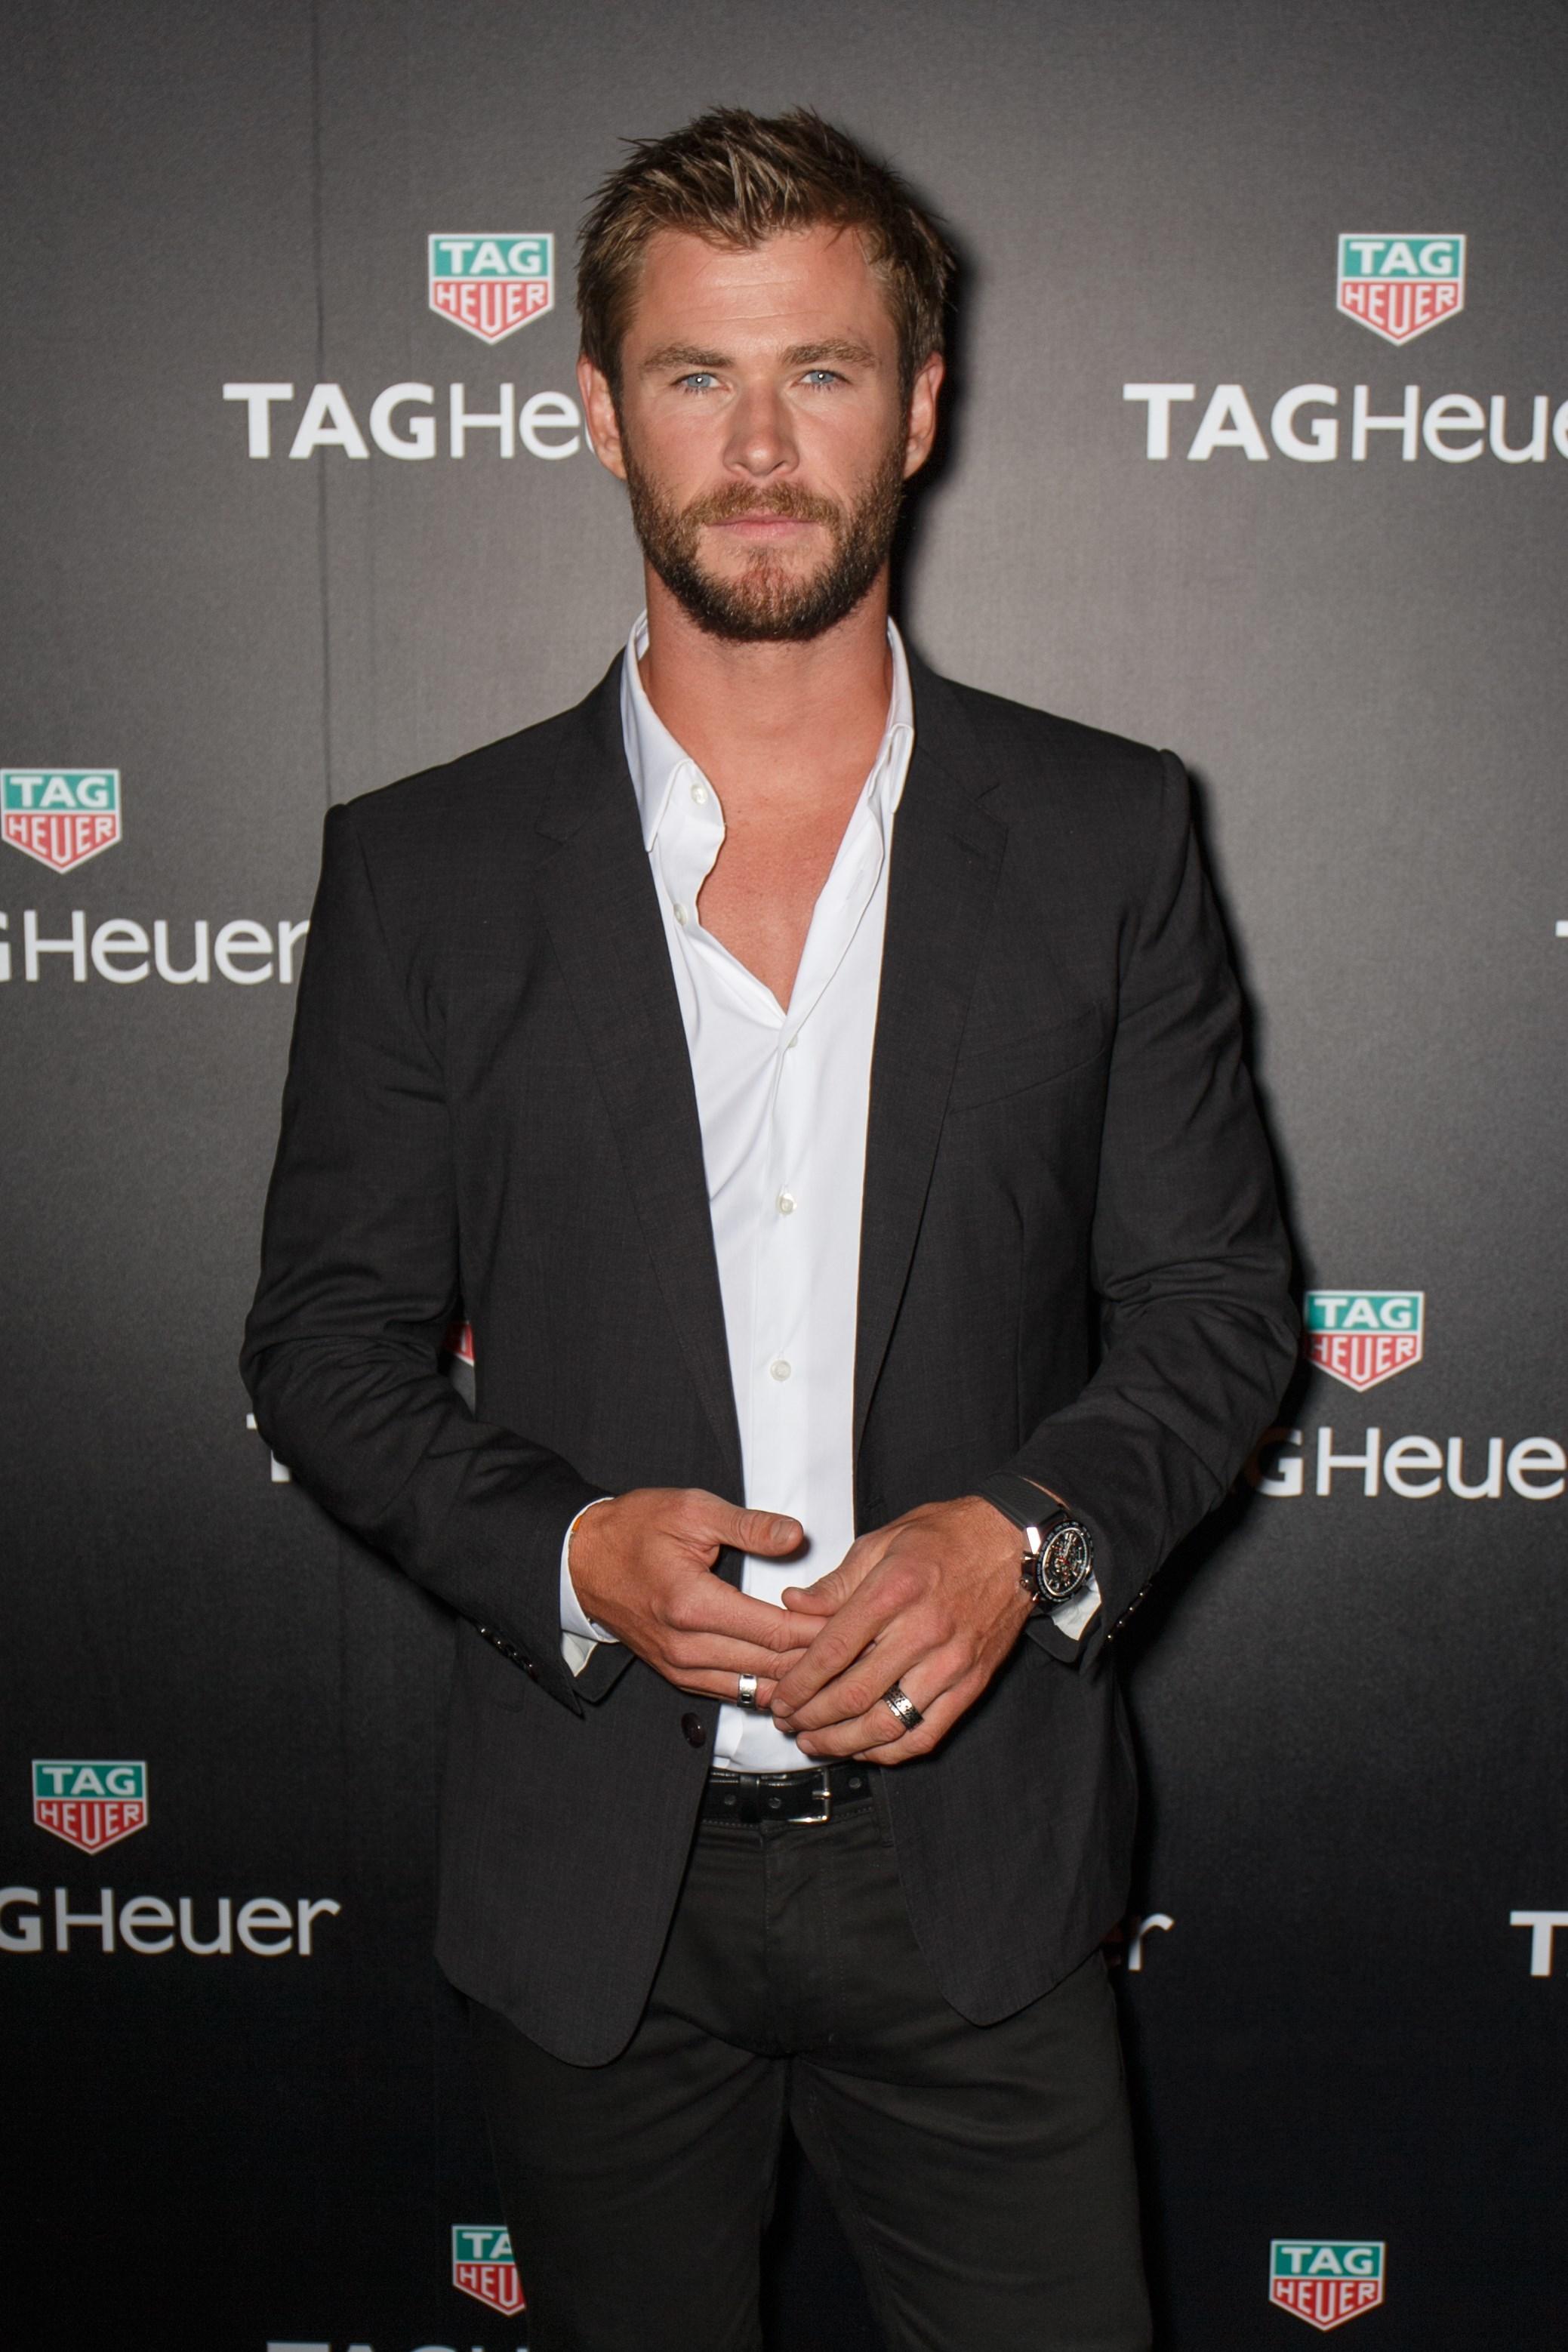 Chris Hemsworth felt suffocated in Hollywood